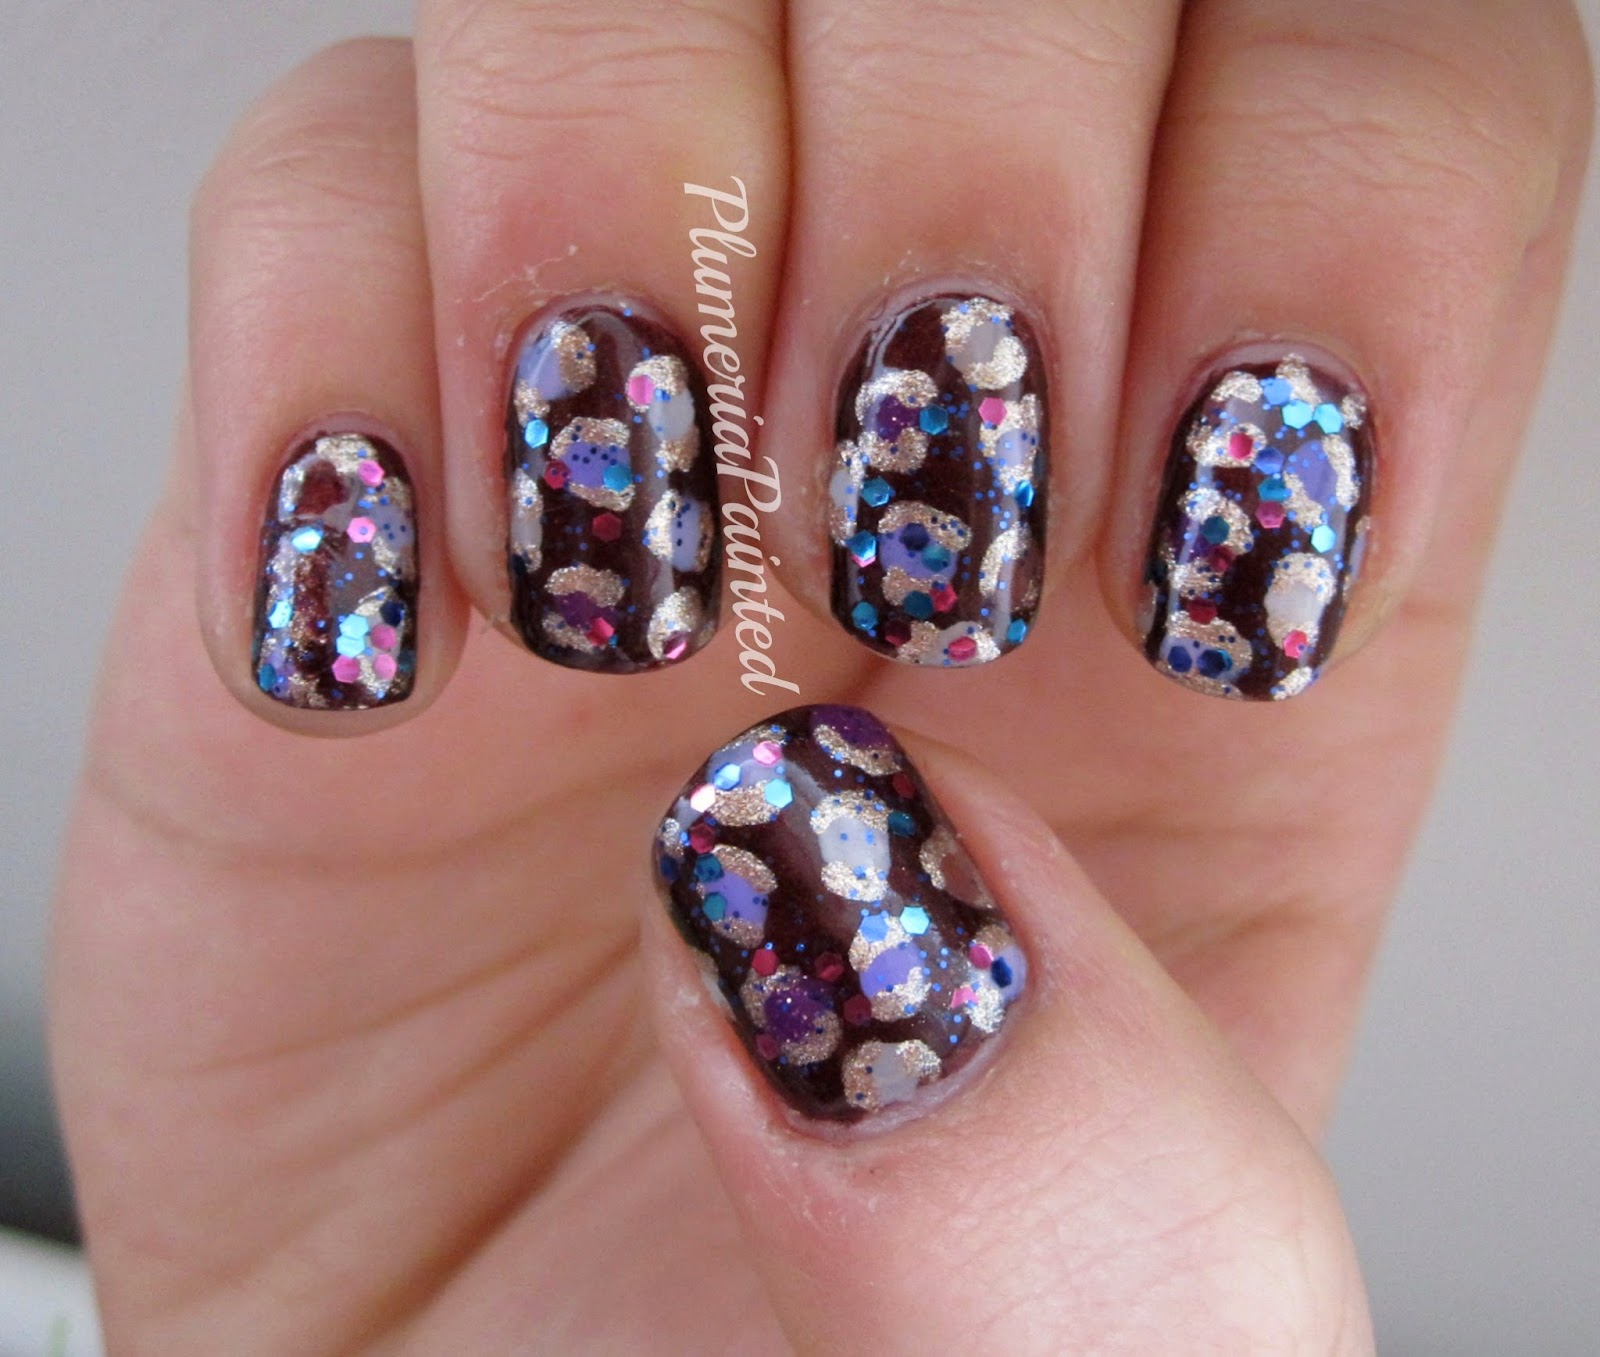 PlumeriaPainted: Purple + brown + glitter leopard print nails